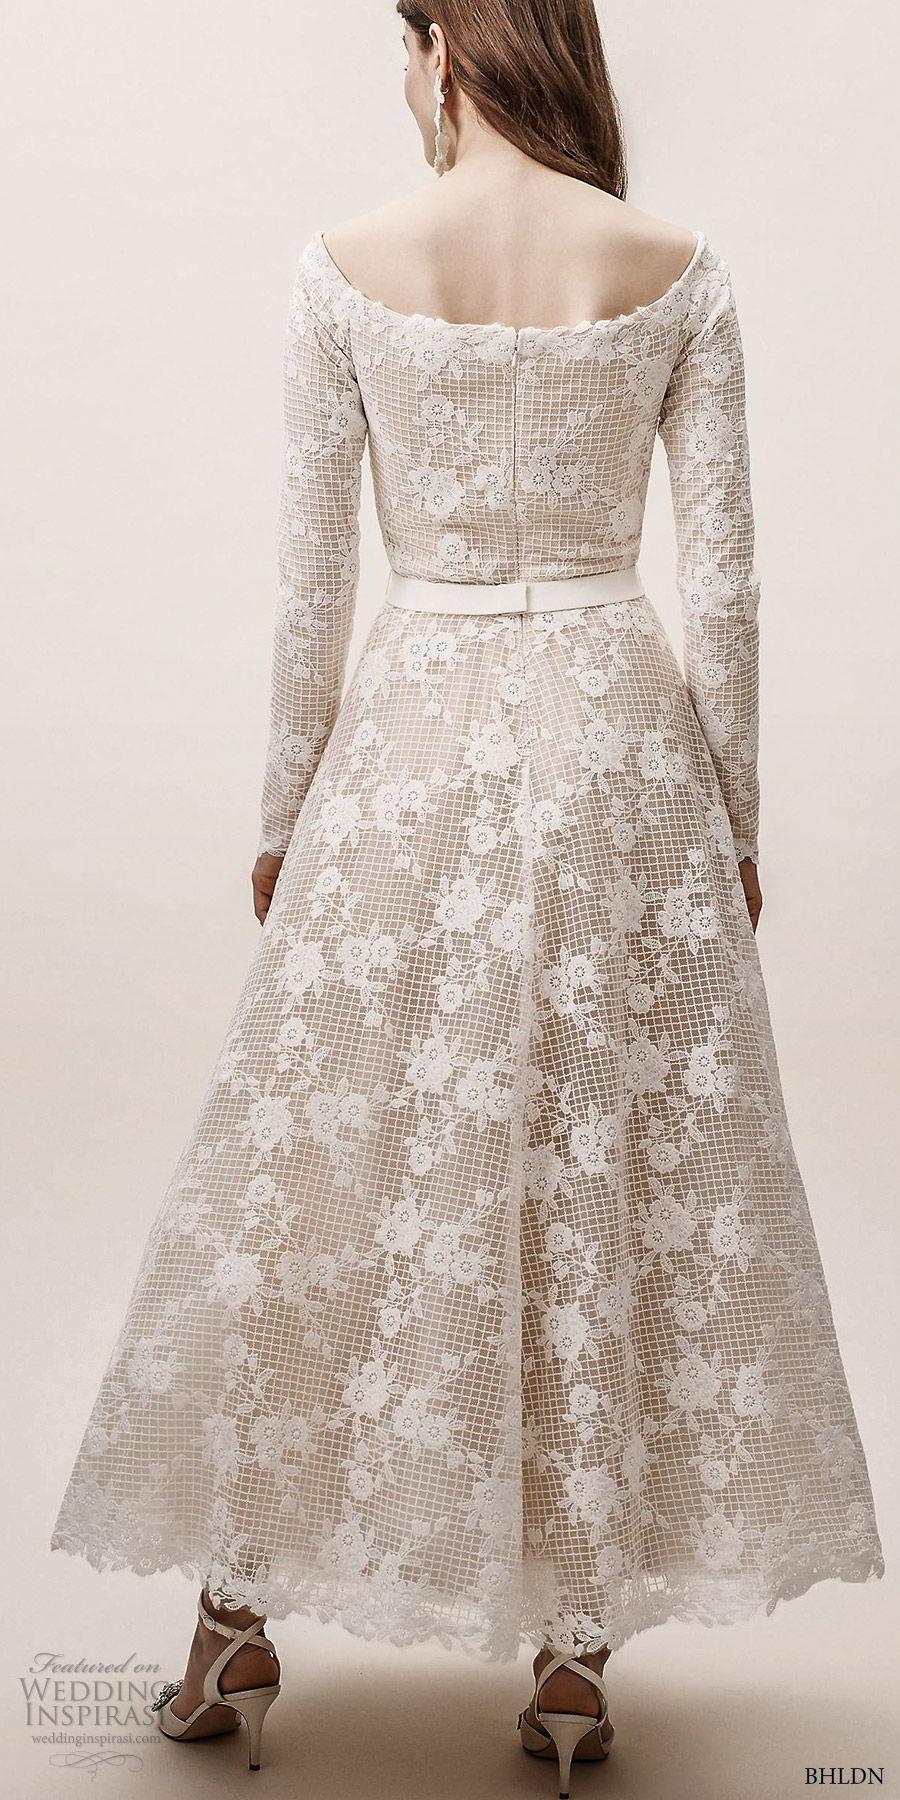 Bhldn S Effortlessly Chic Spring 2019 Wedding Dresses